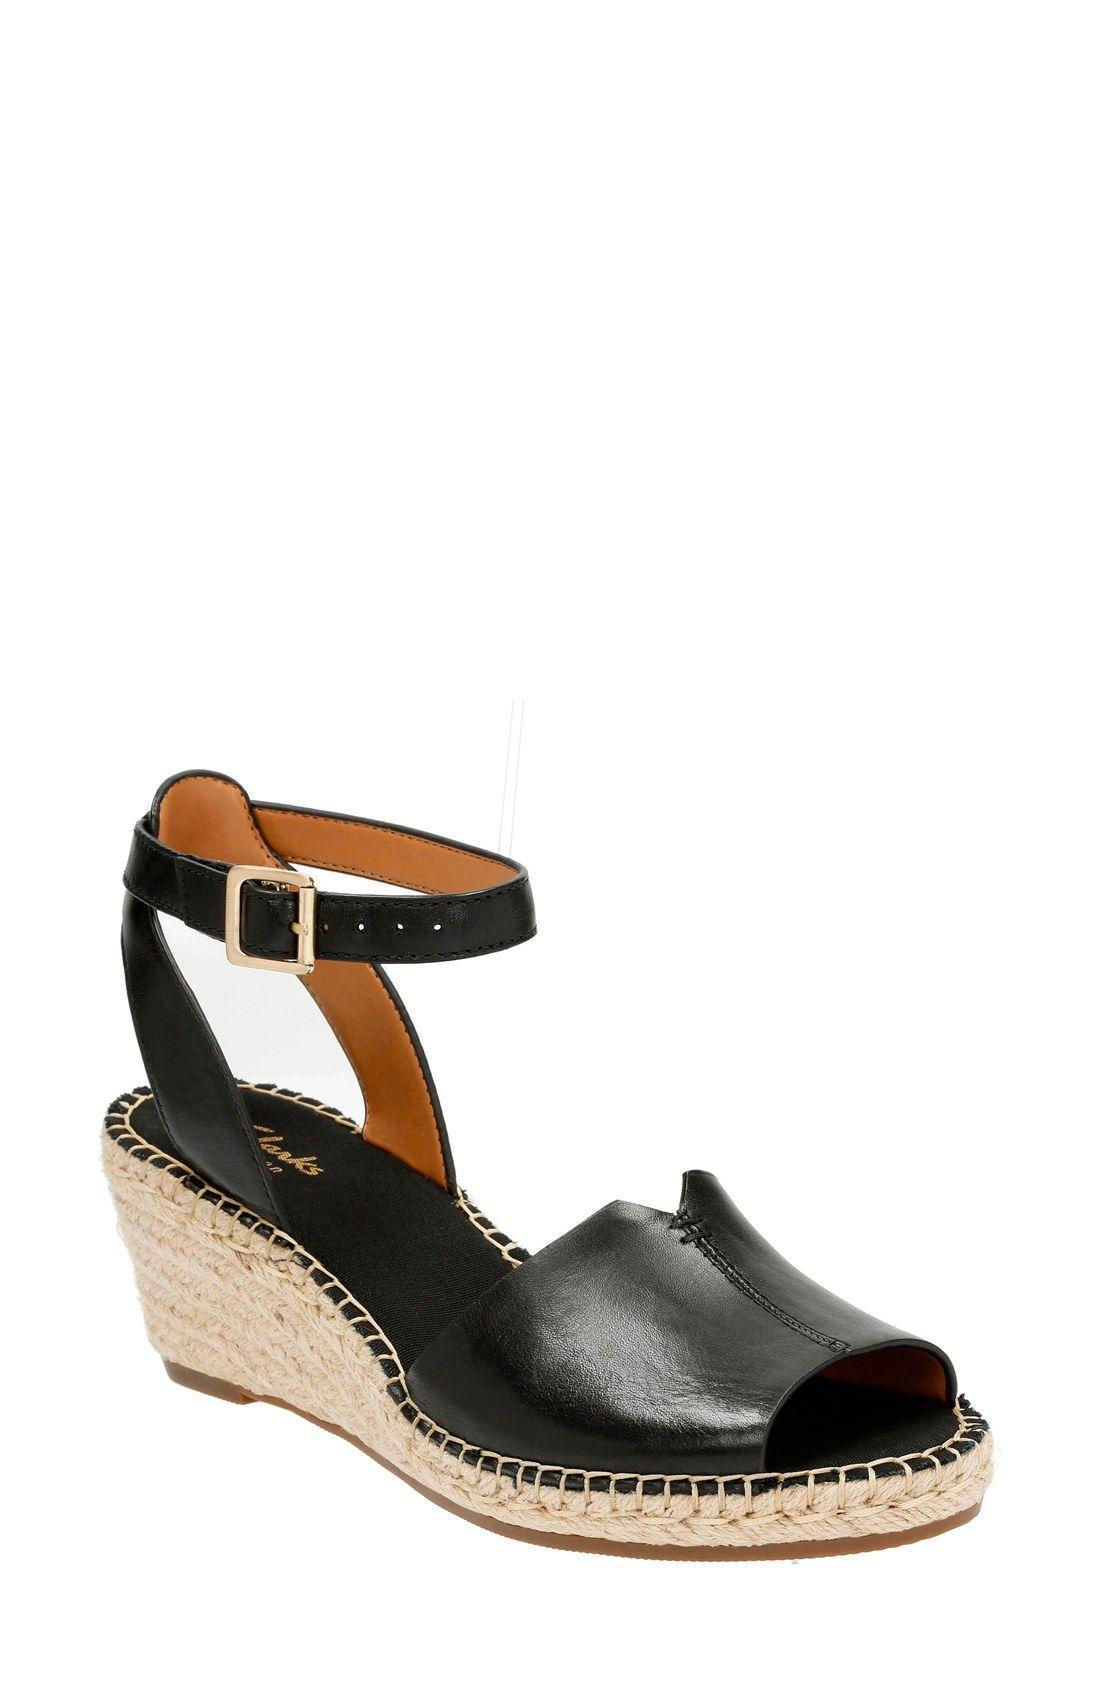 5c96fce23b7 Clarks 'Petrina Selma' Sandal (Women) Very comfy!   tiptoe   Shoes ...